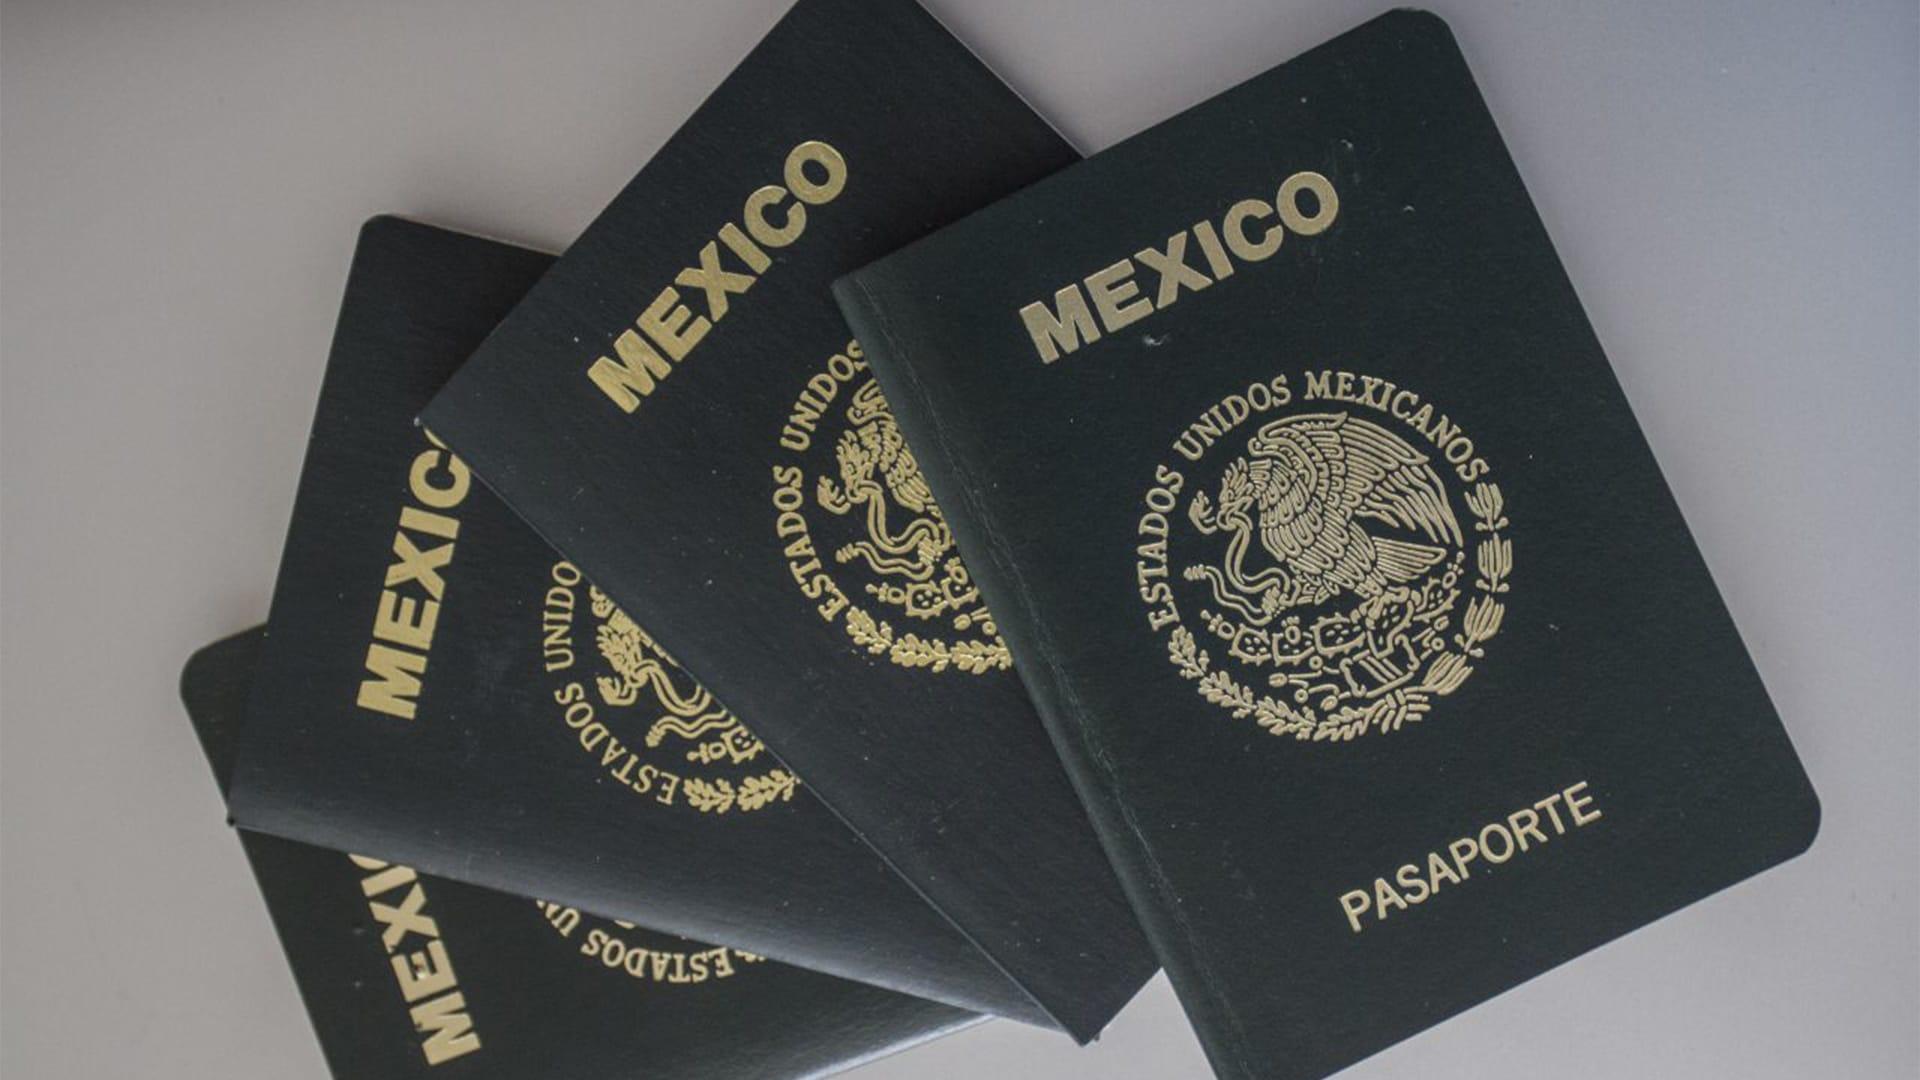 Requisitos para obtener un pasaporte en Veracruz México